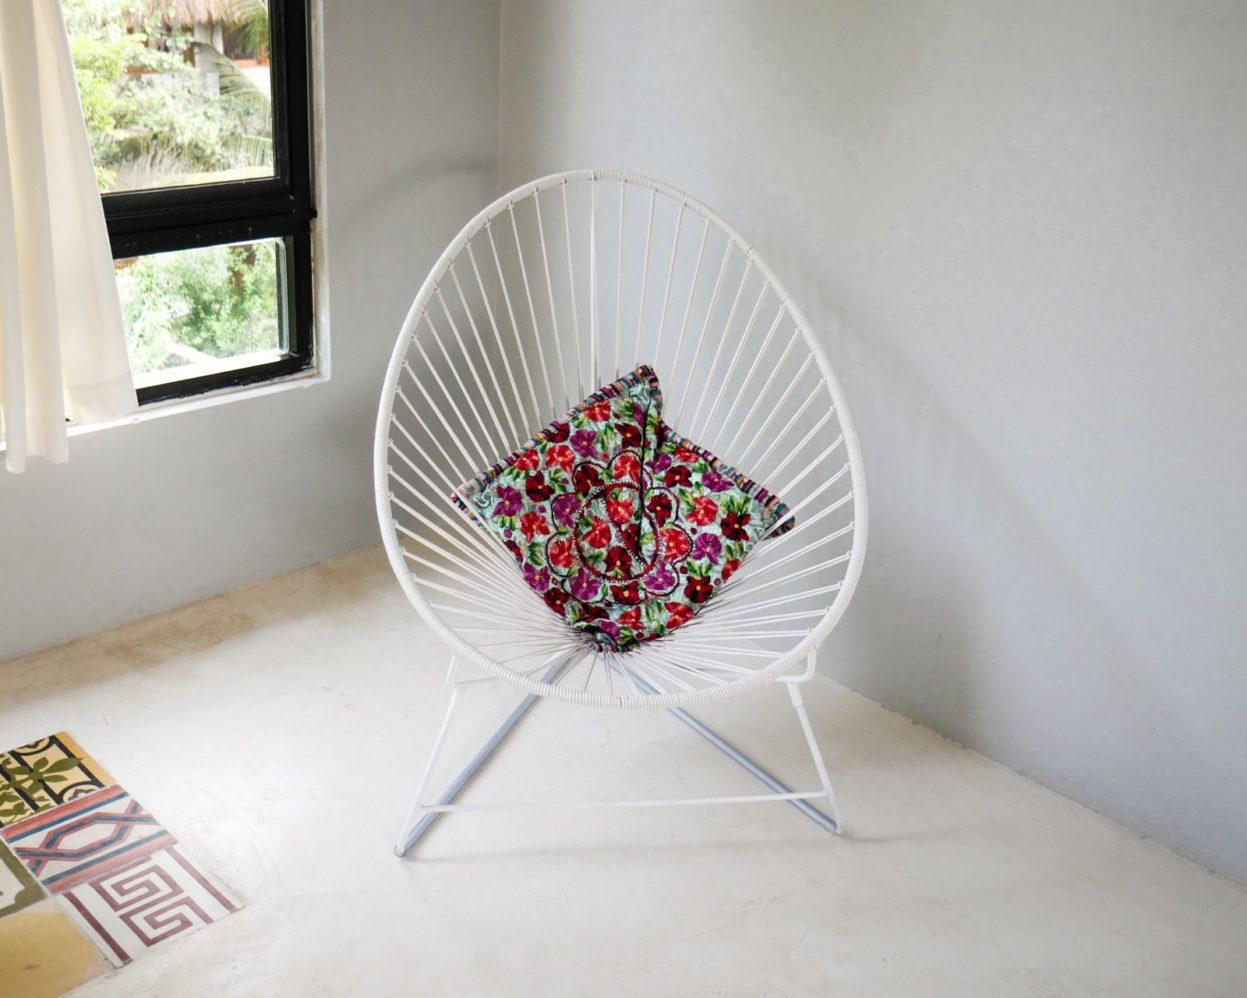 Design hotel in tulum brooklyn tropicali for Design hotel tulum